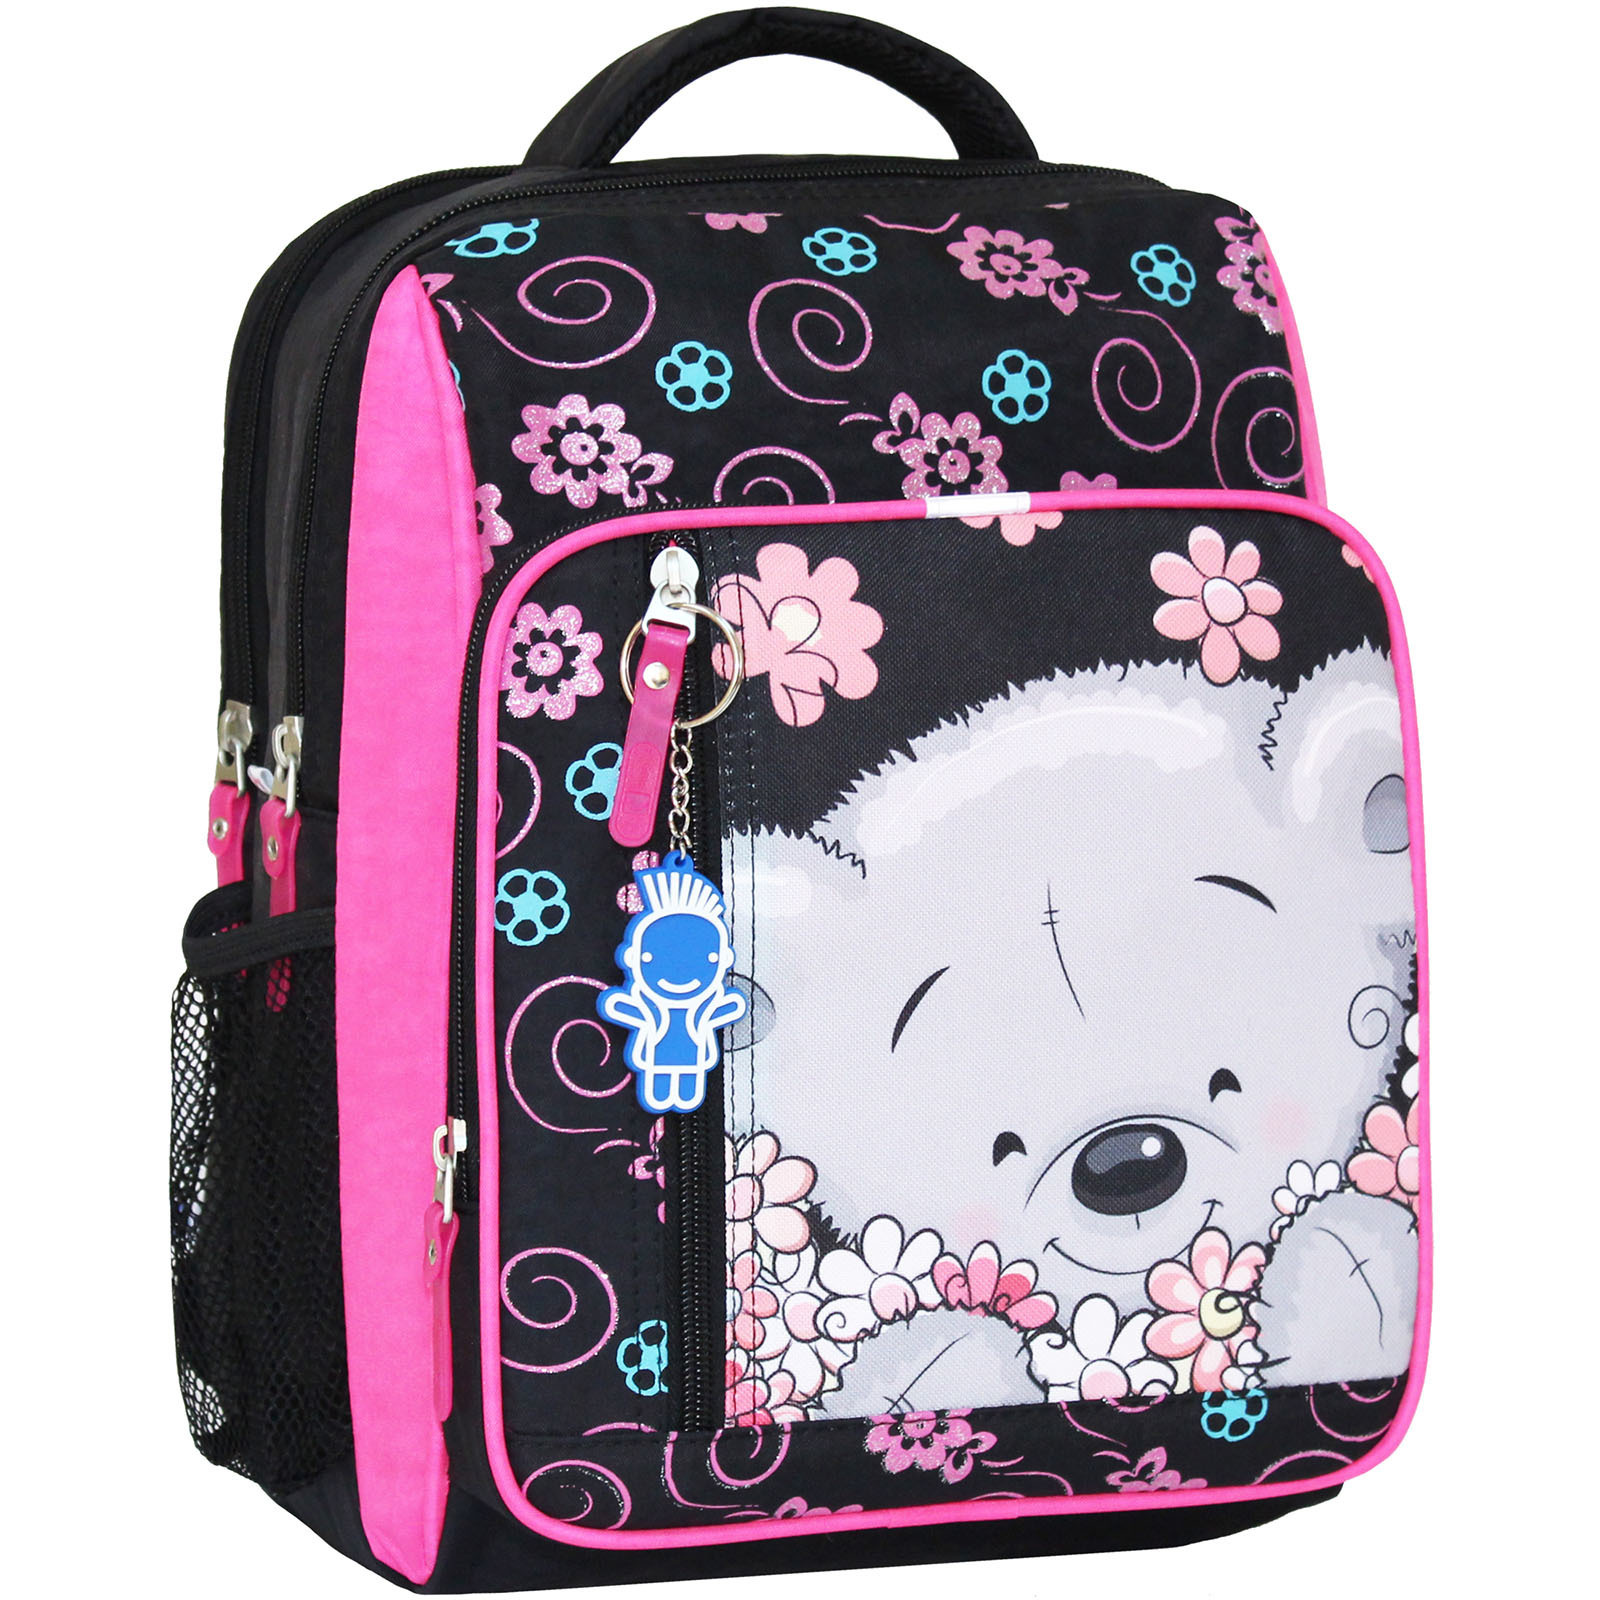 Школьные рюкзаки Рюкзак школьный Bagland Школьник 8 л. черный 406 (0012870) IMG_7733_суб_406_.JPG